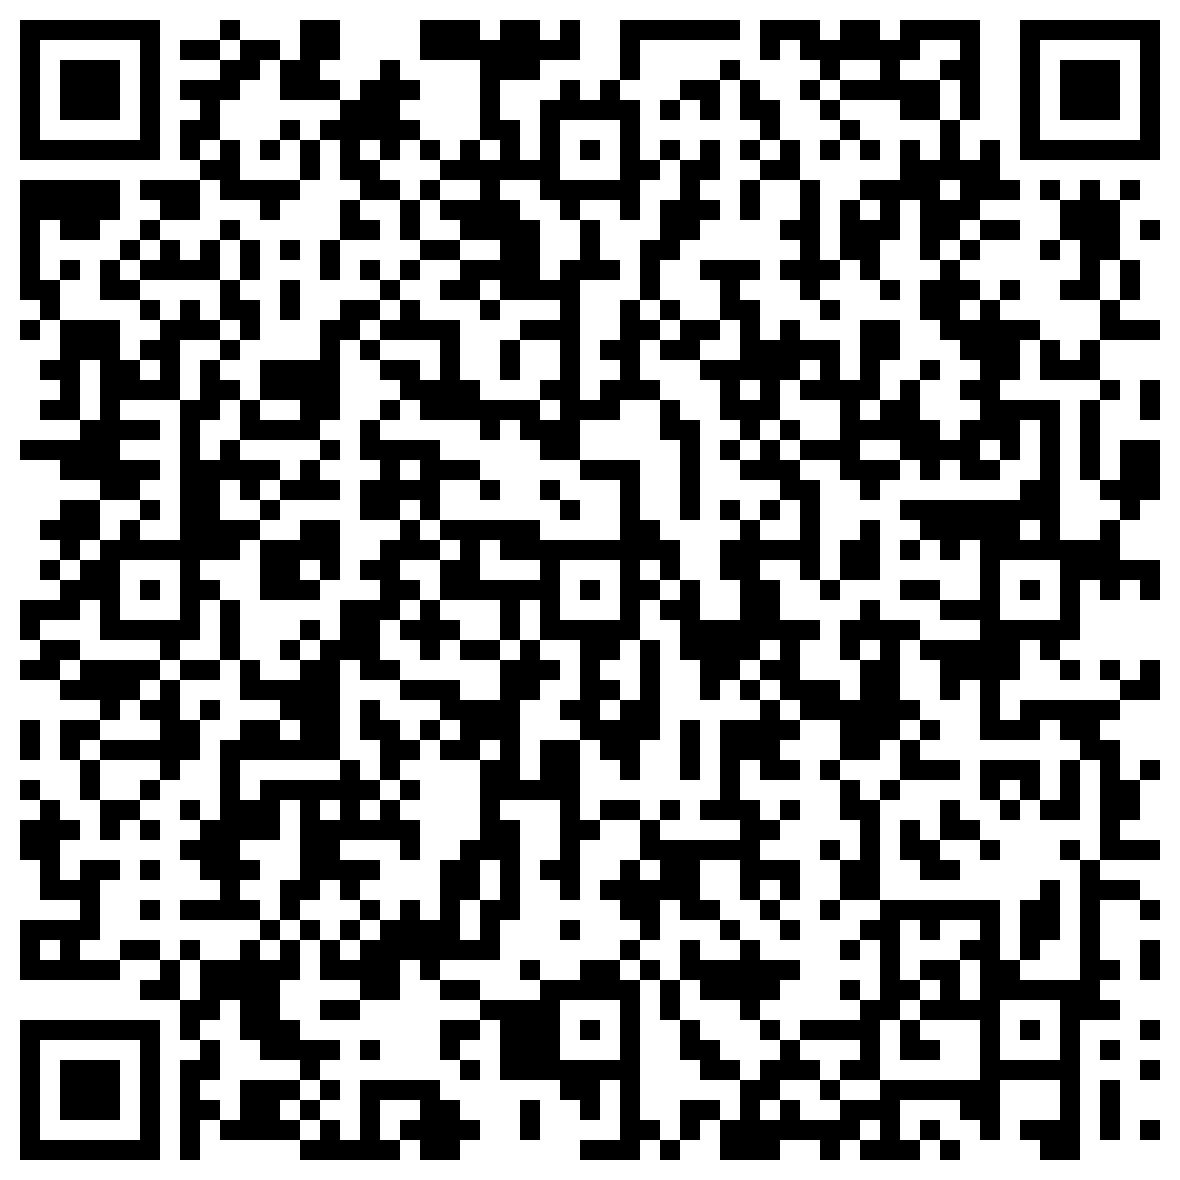 QR code v-card